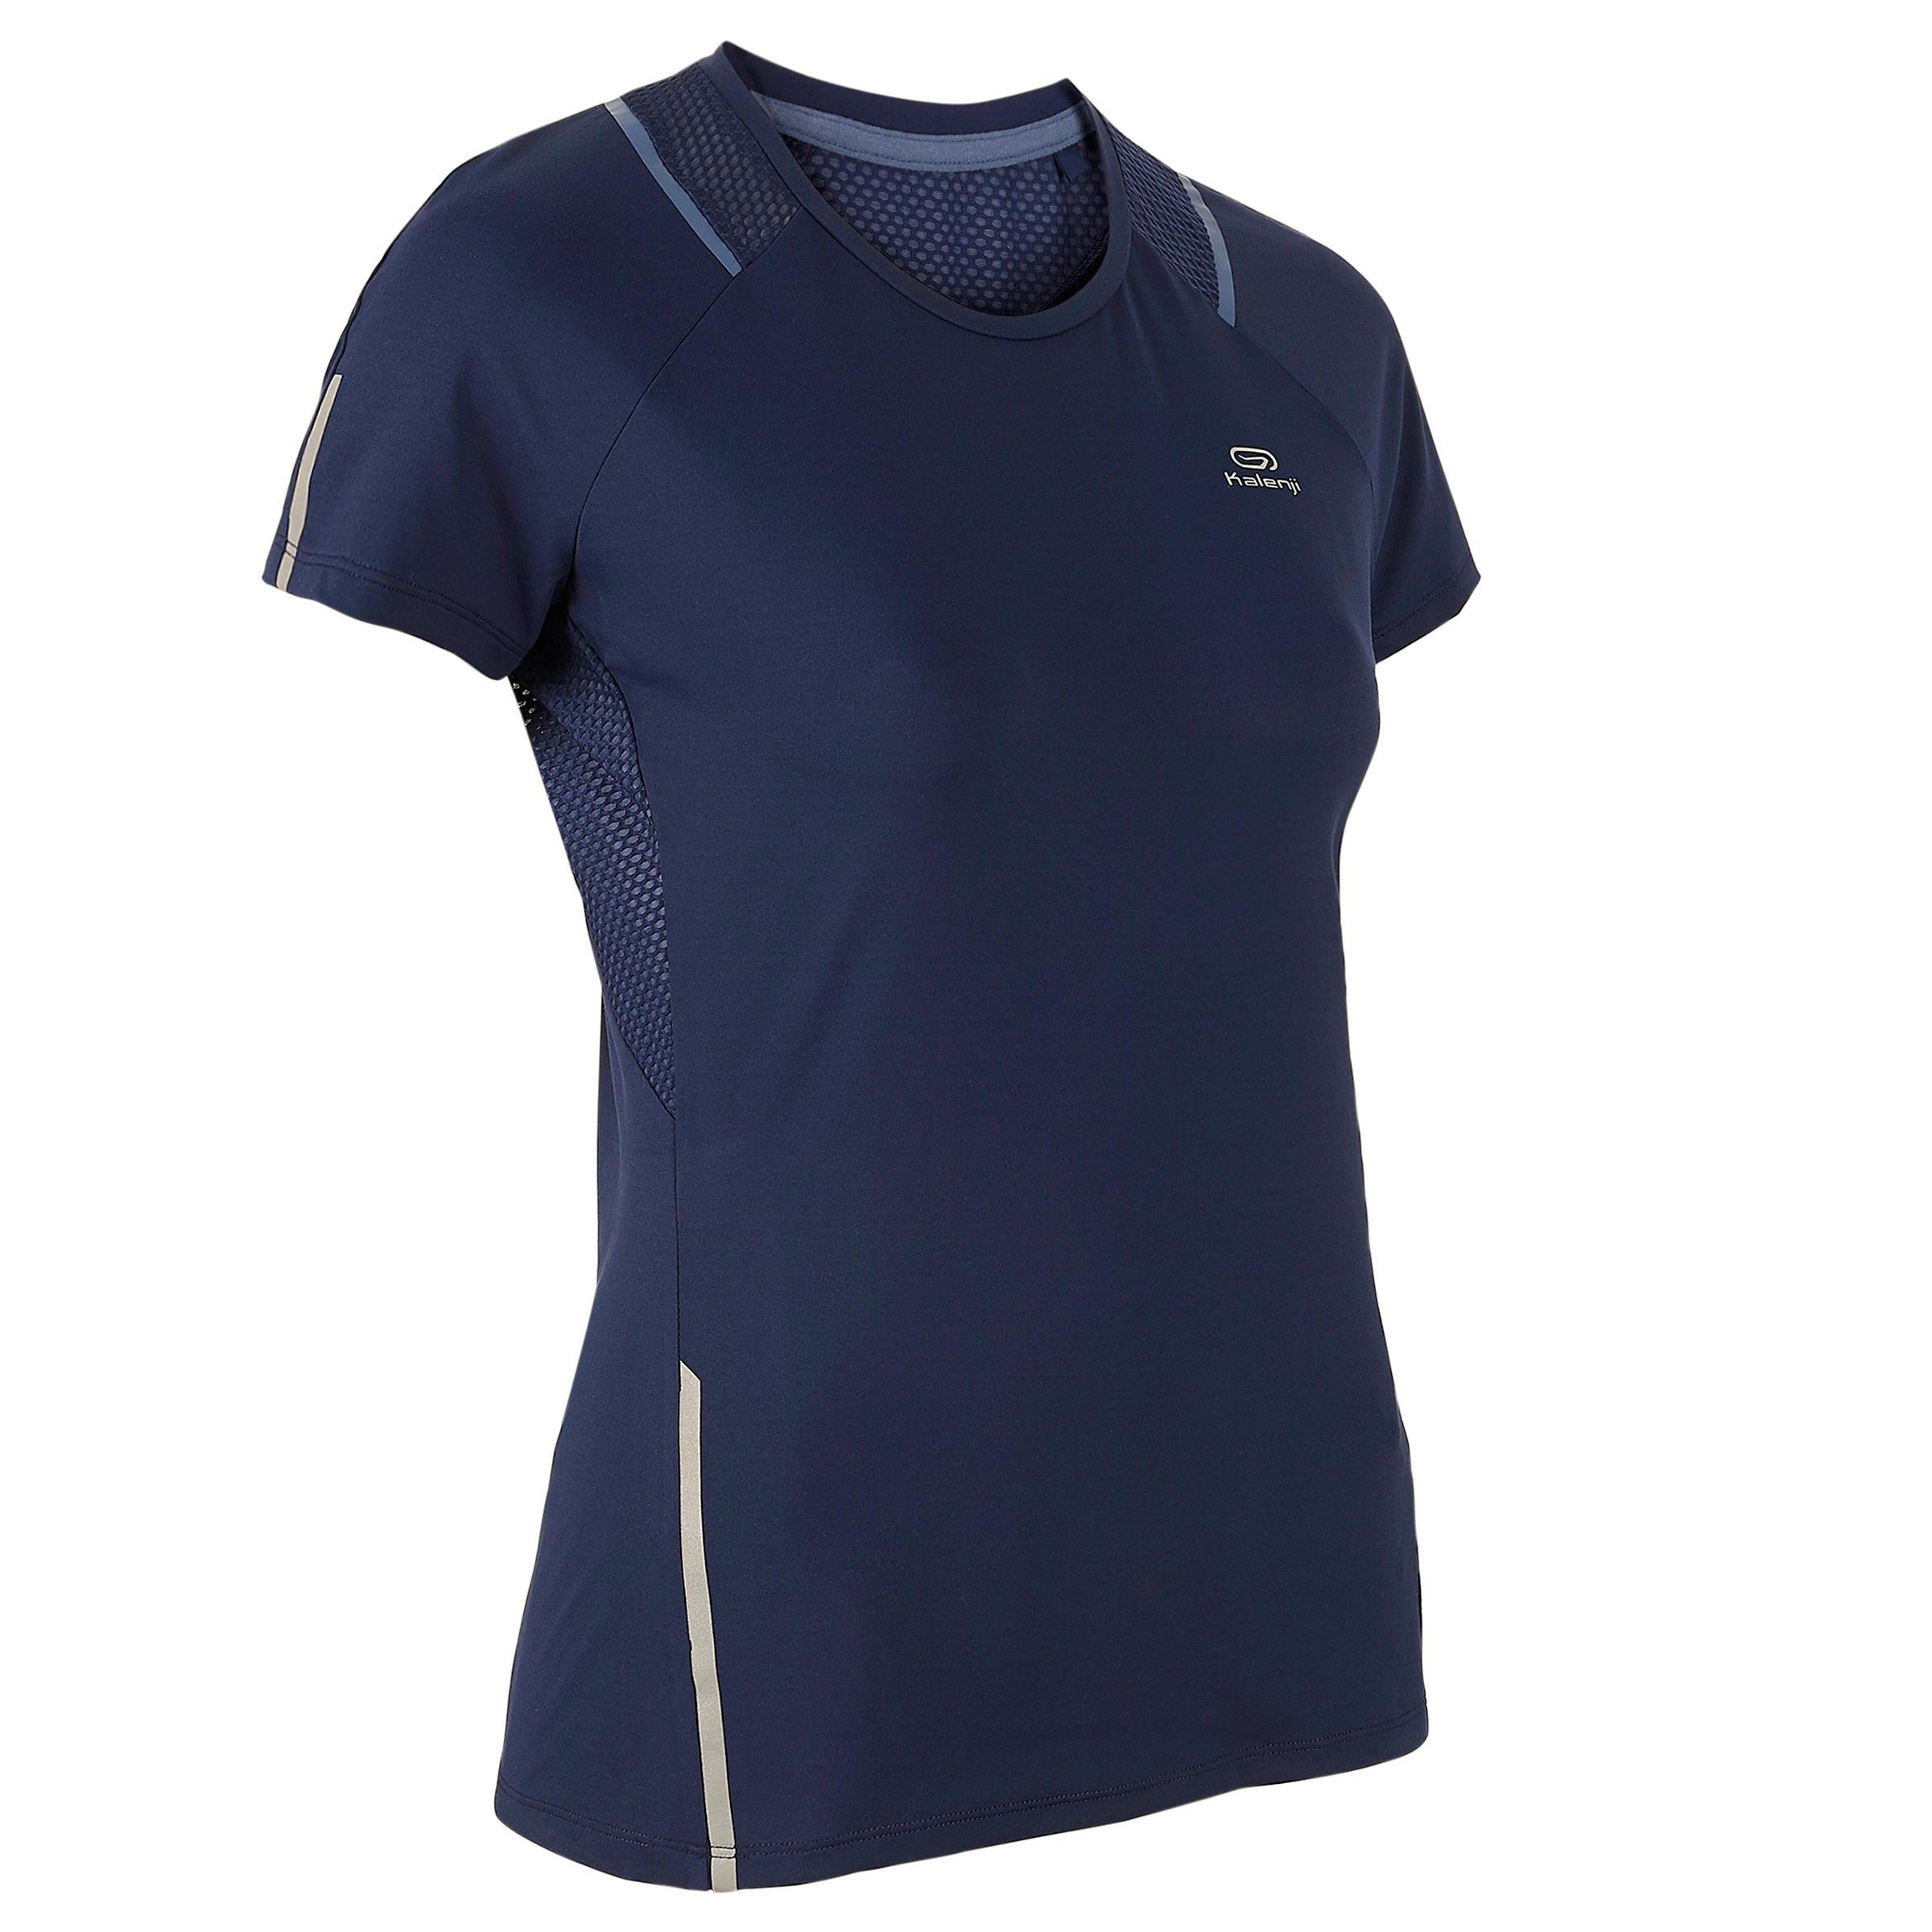 Laufshirt kurzarm Run Dry+ Damen marineblau | Sportbekleidung > Sportshirts > Laufshirts | Blau | Kalenji